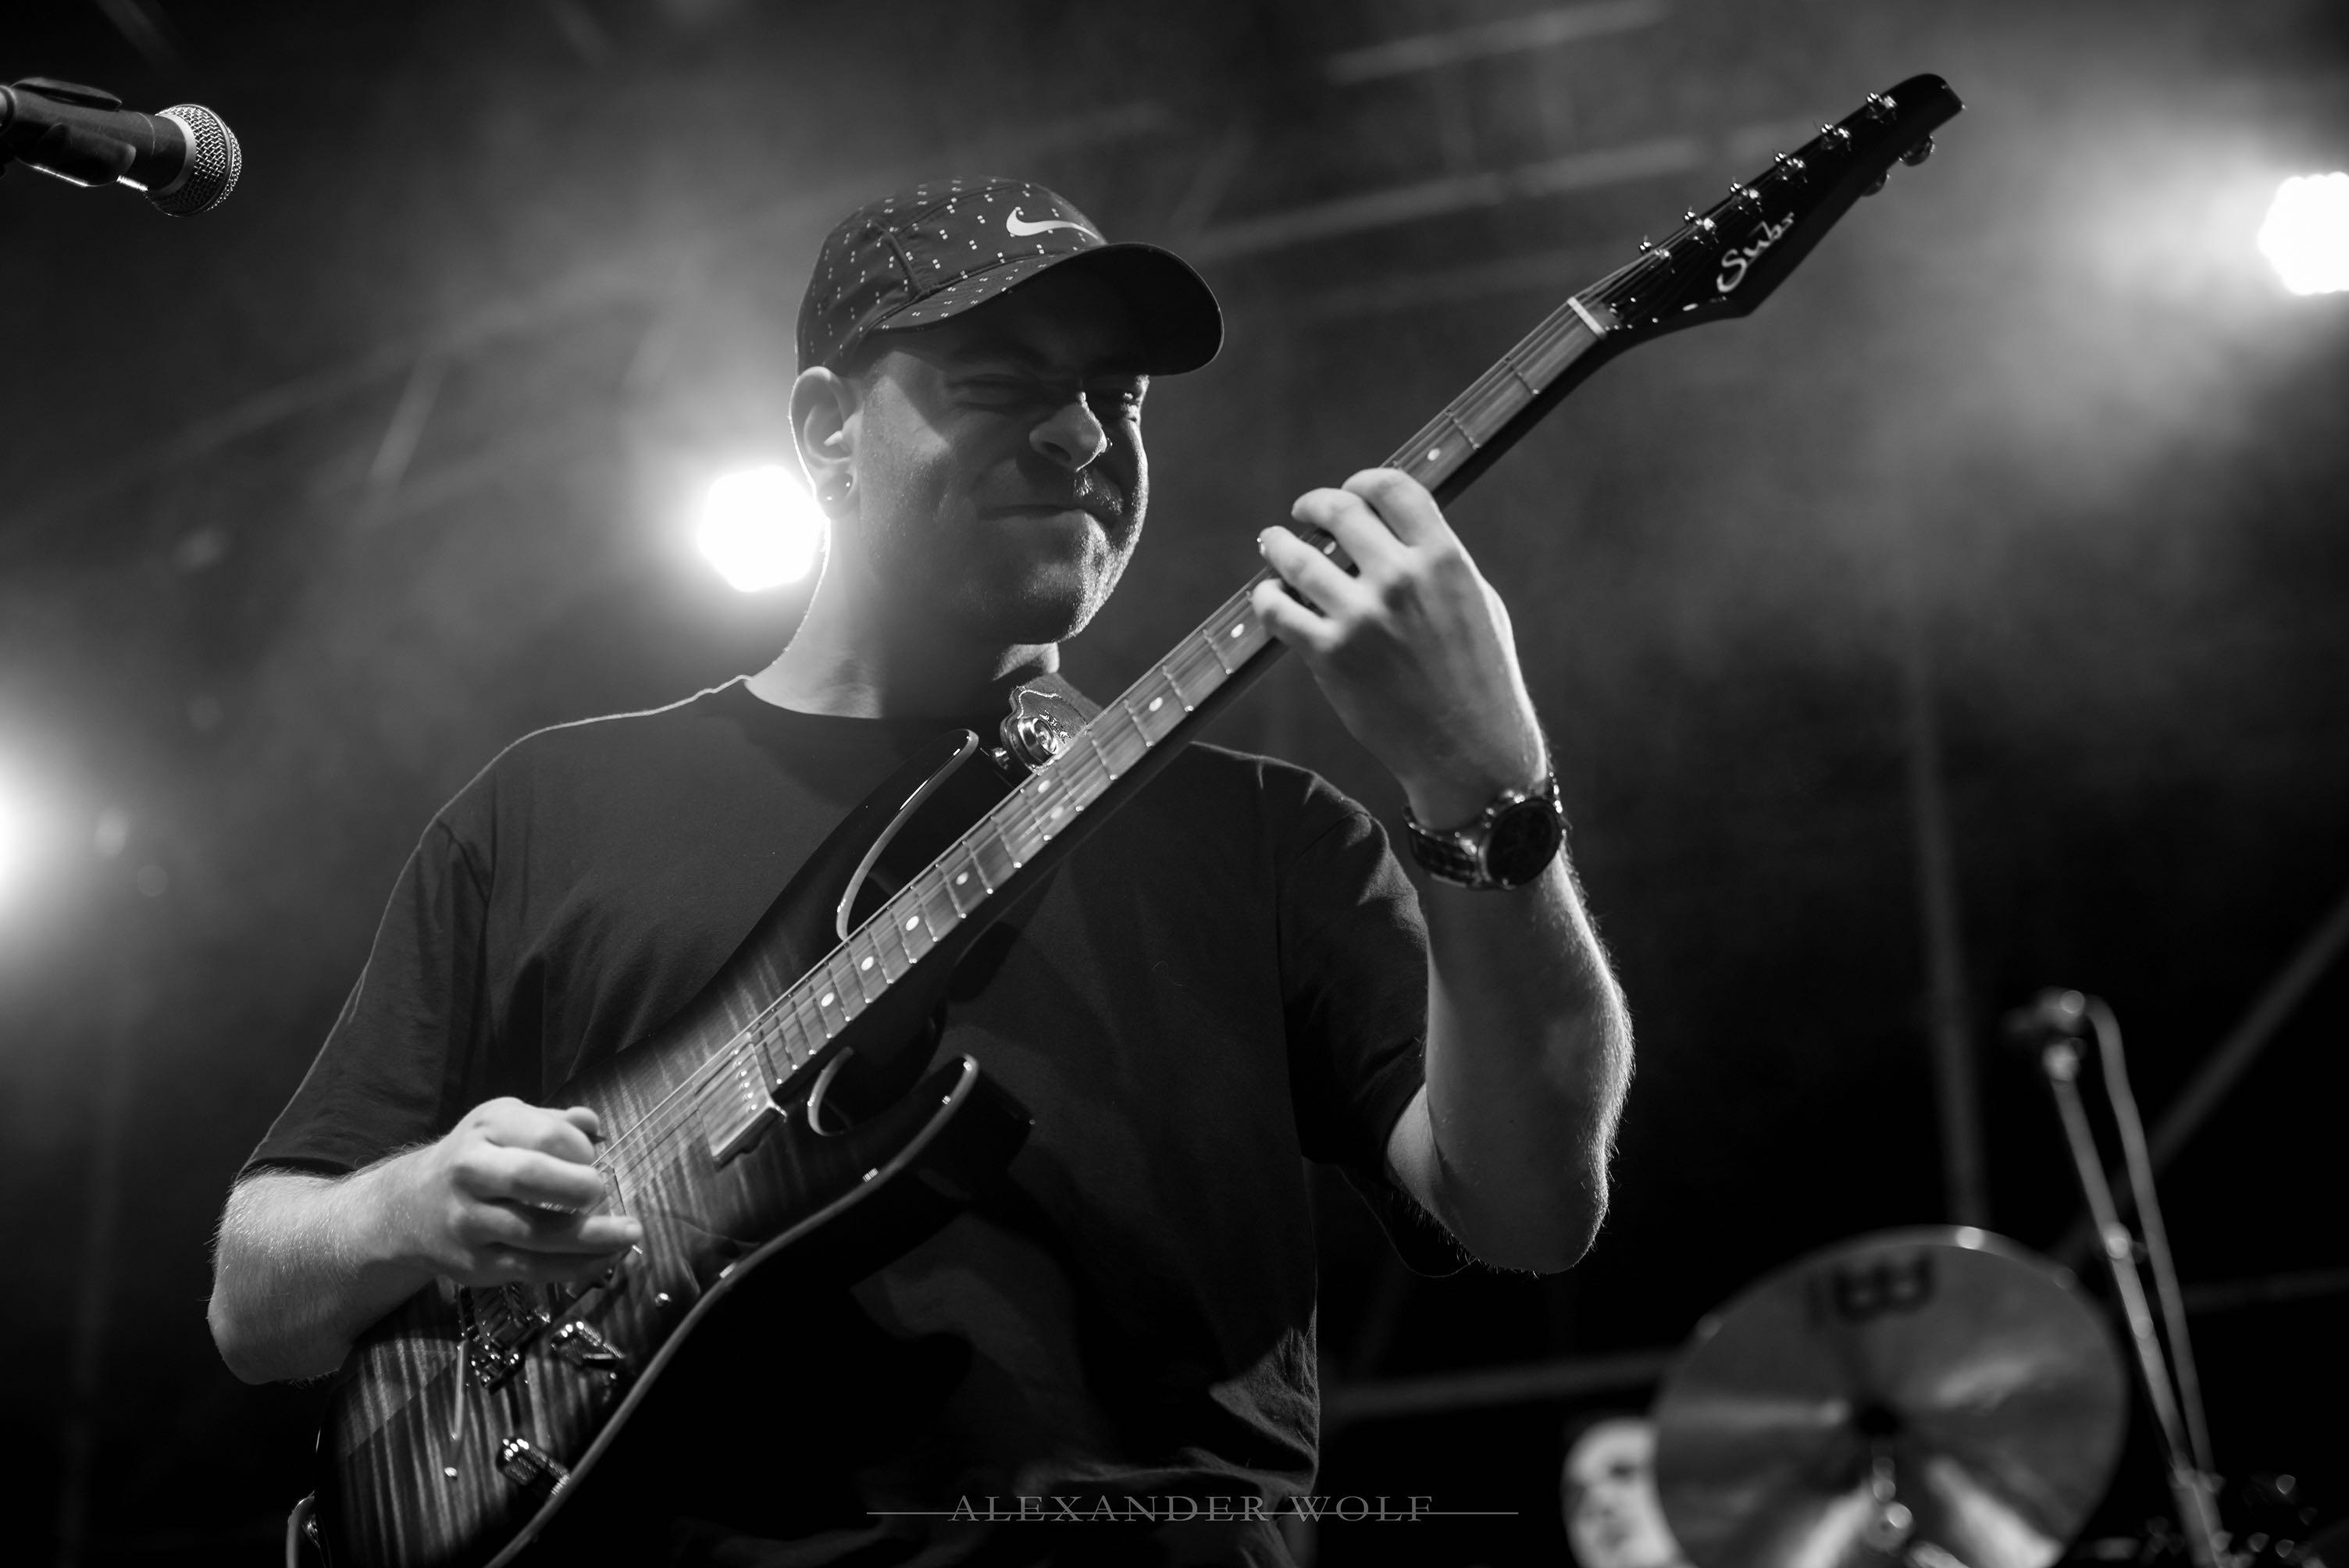 Intervals performing at Krank'd Up 2017